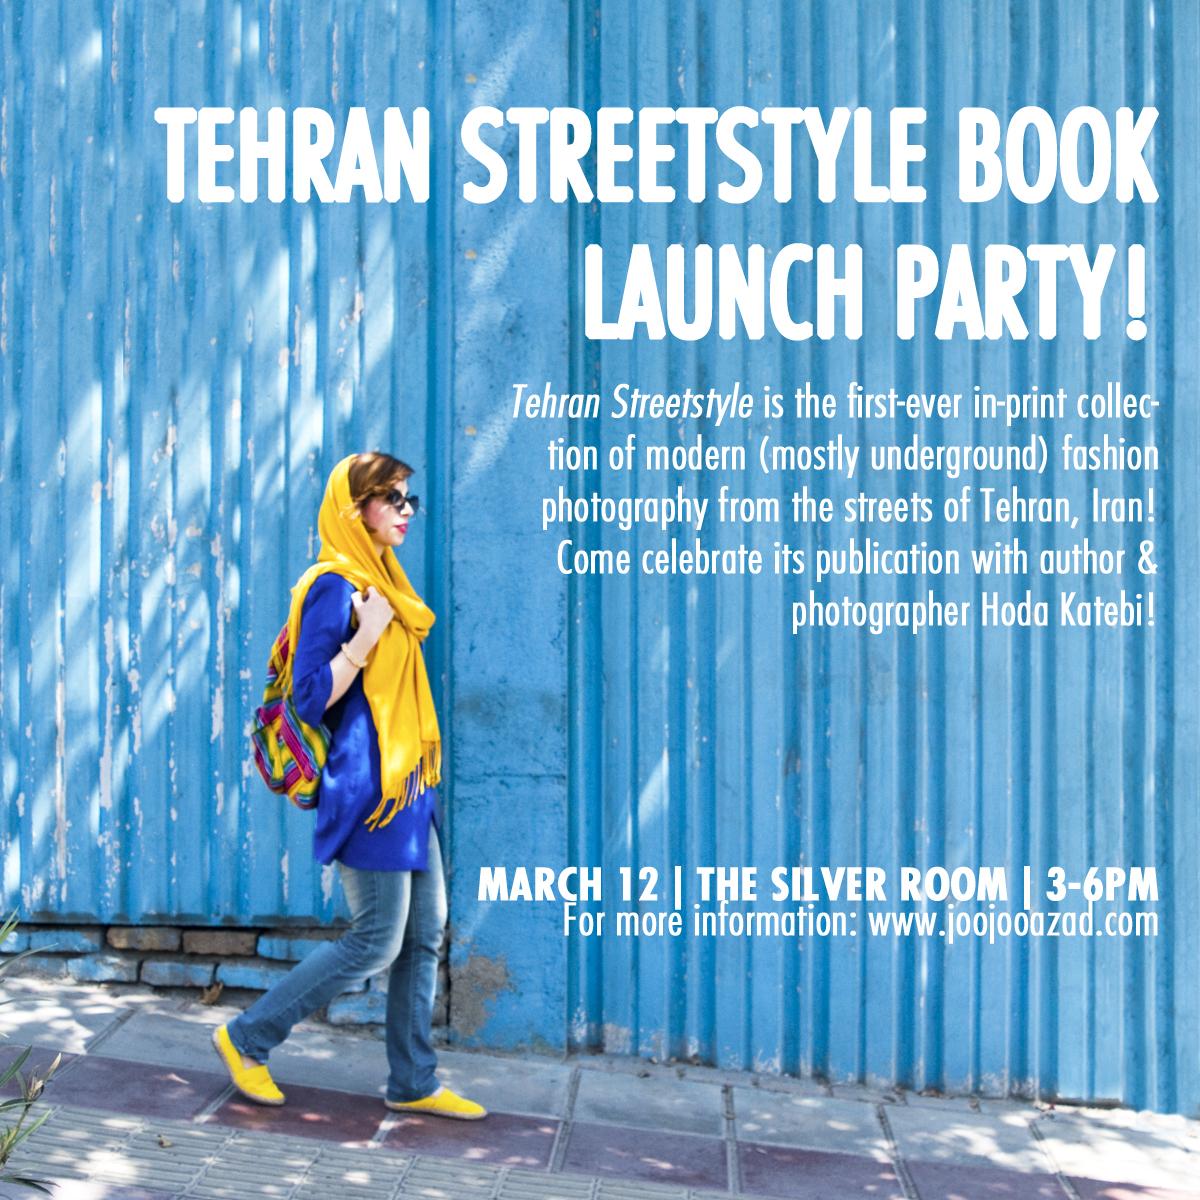 Tehran fashion, Iranian fashion, tehran streetstyle, iran streetstyle, iranian streetstyle, hijab fashion, hijab streetstyle, hijab fashion blog